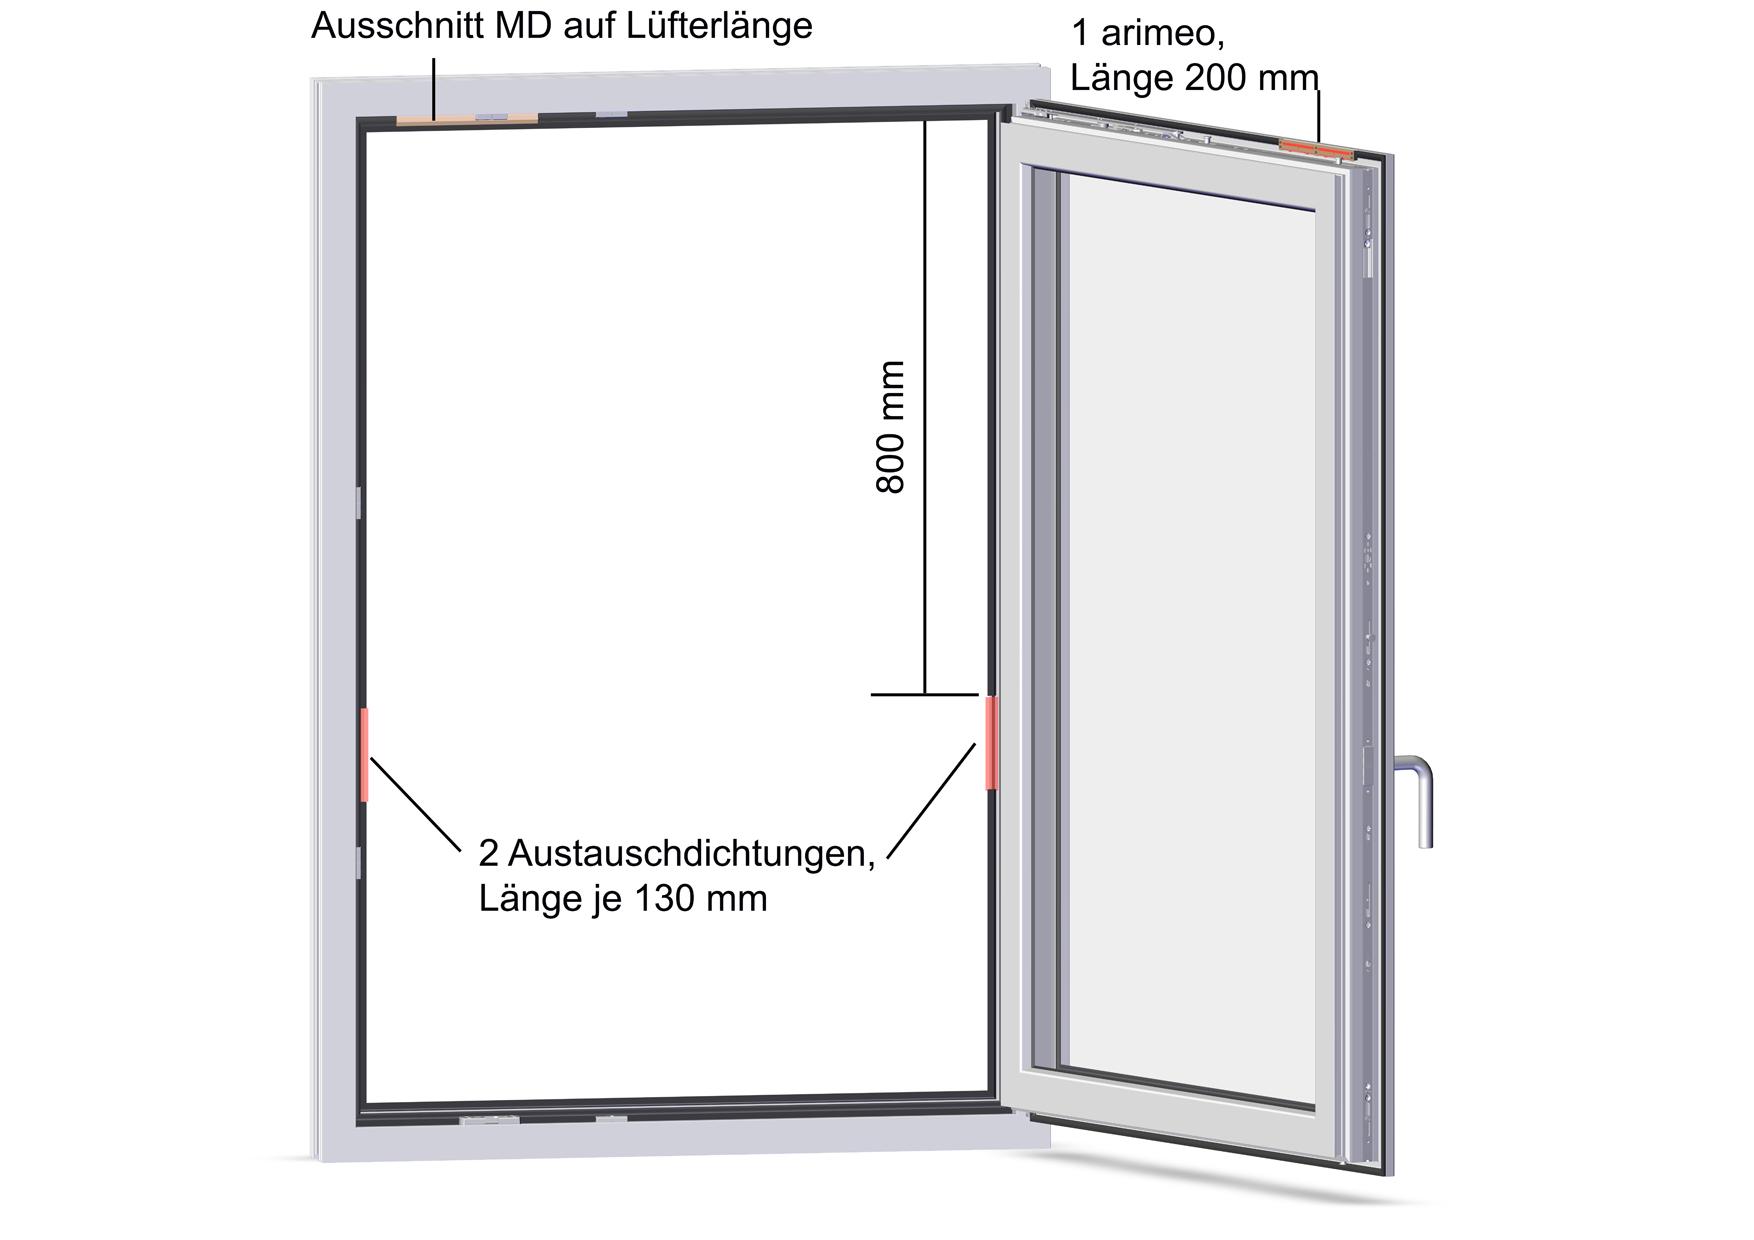 arimeo classic S Fensterfalzlüfter Einbauvariante single MD